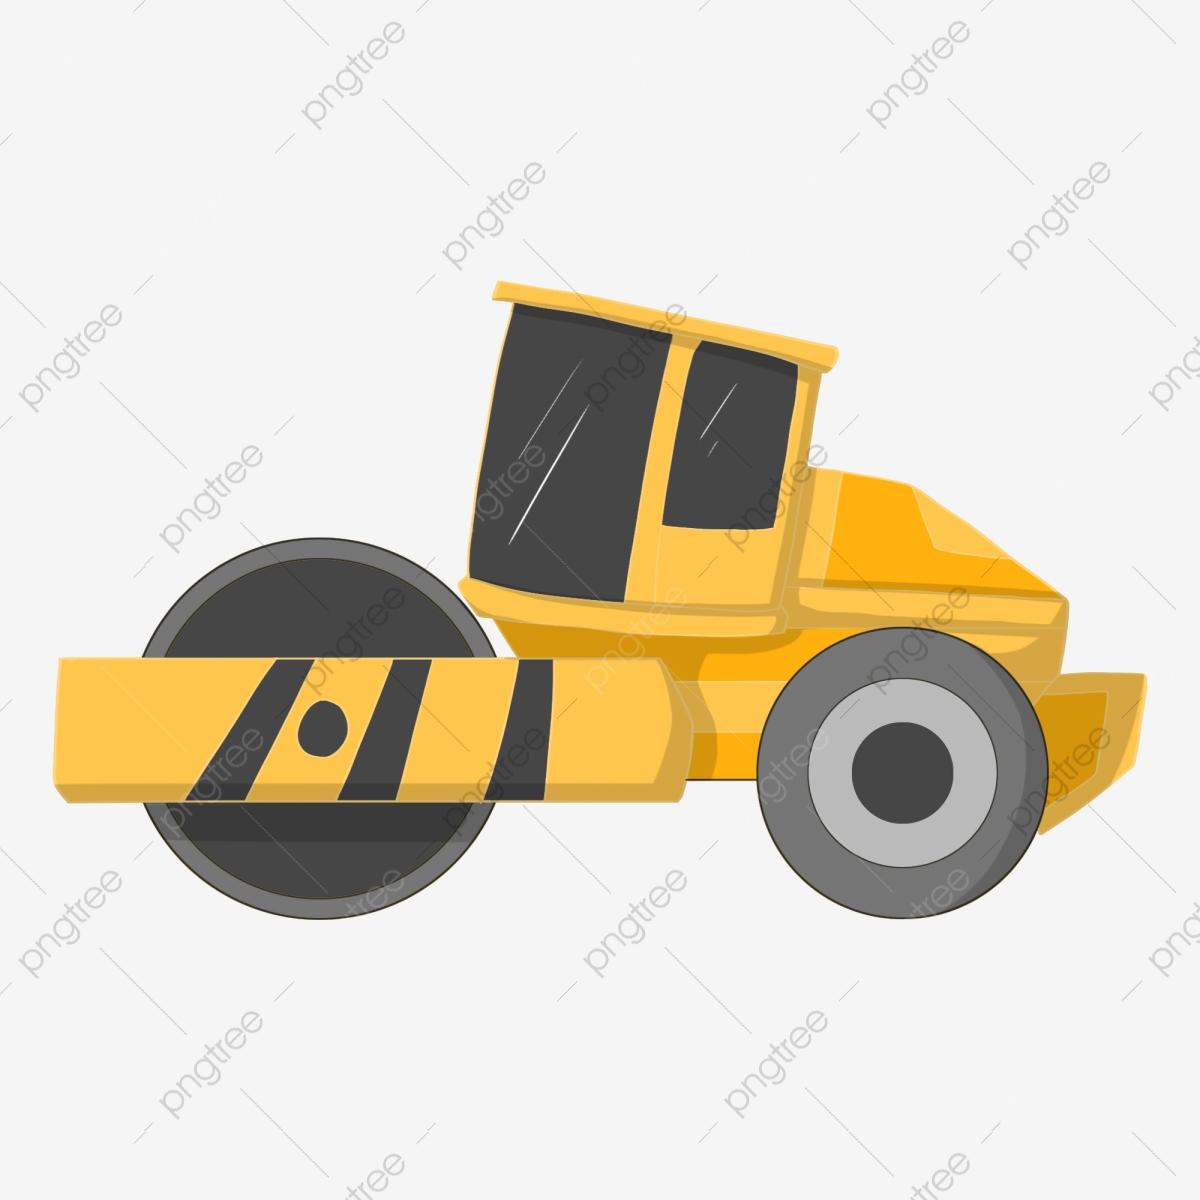 Engineer clipart municipal engineer. Yellow roller engineering machinery